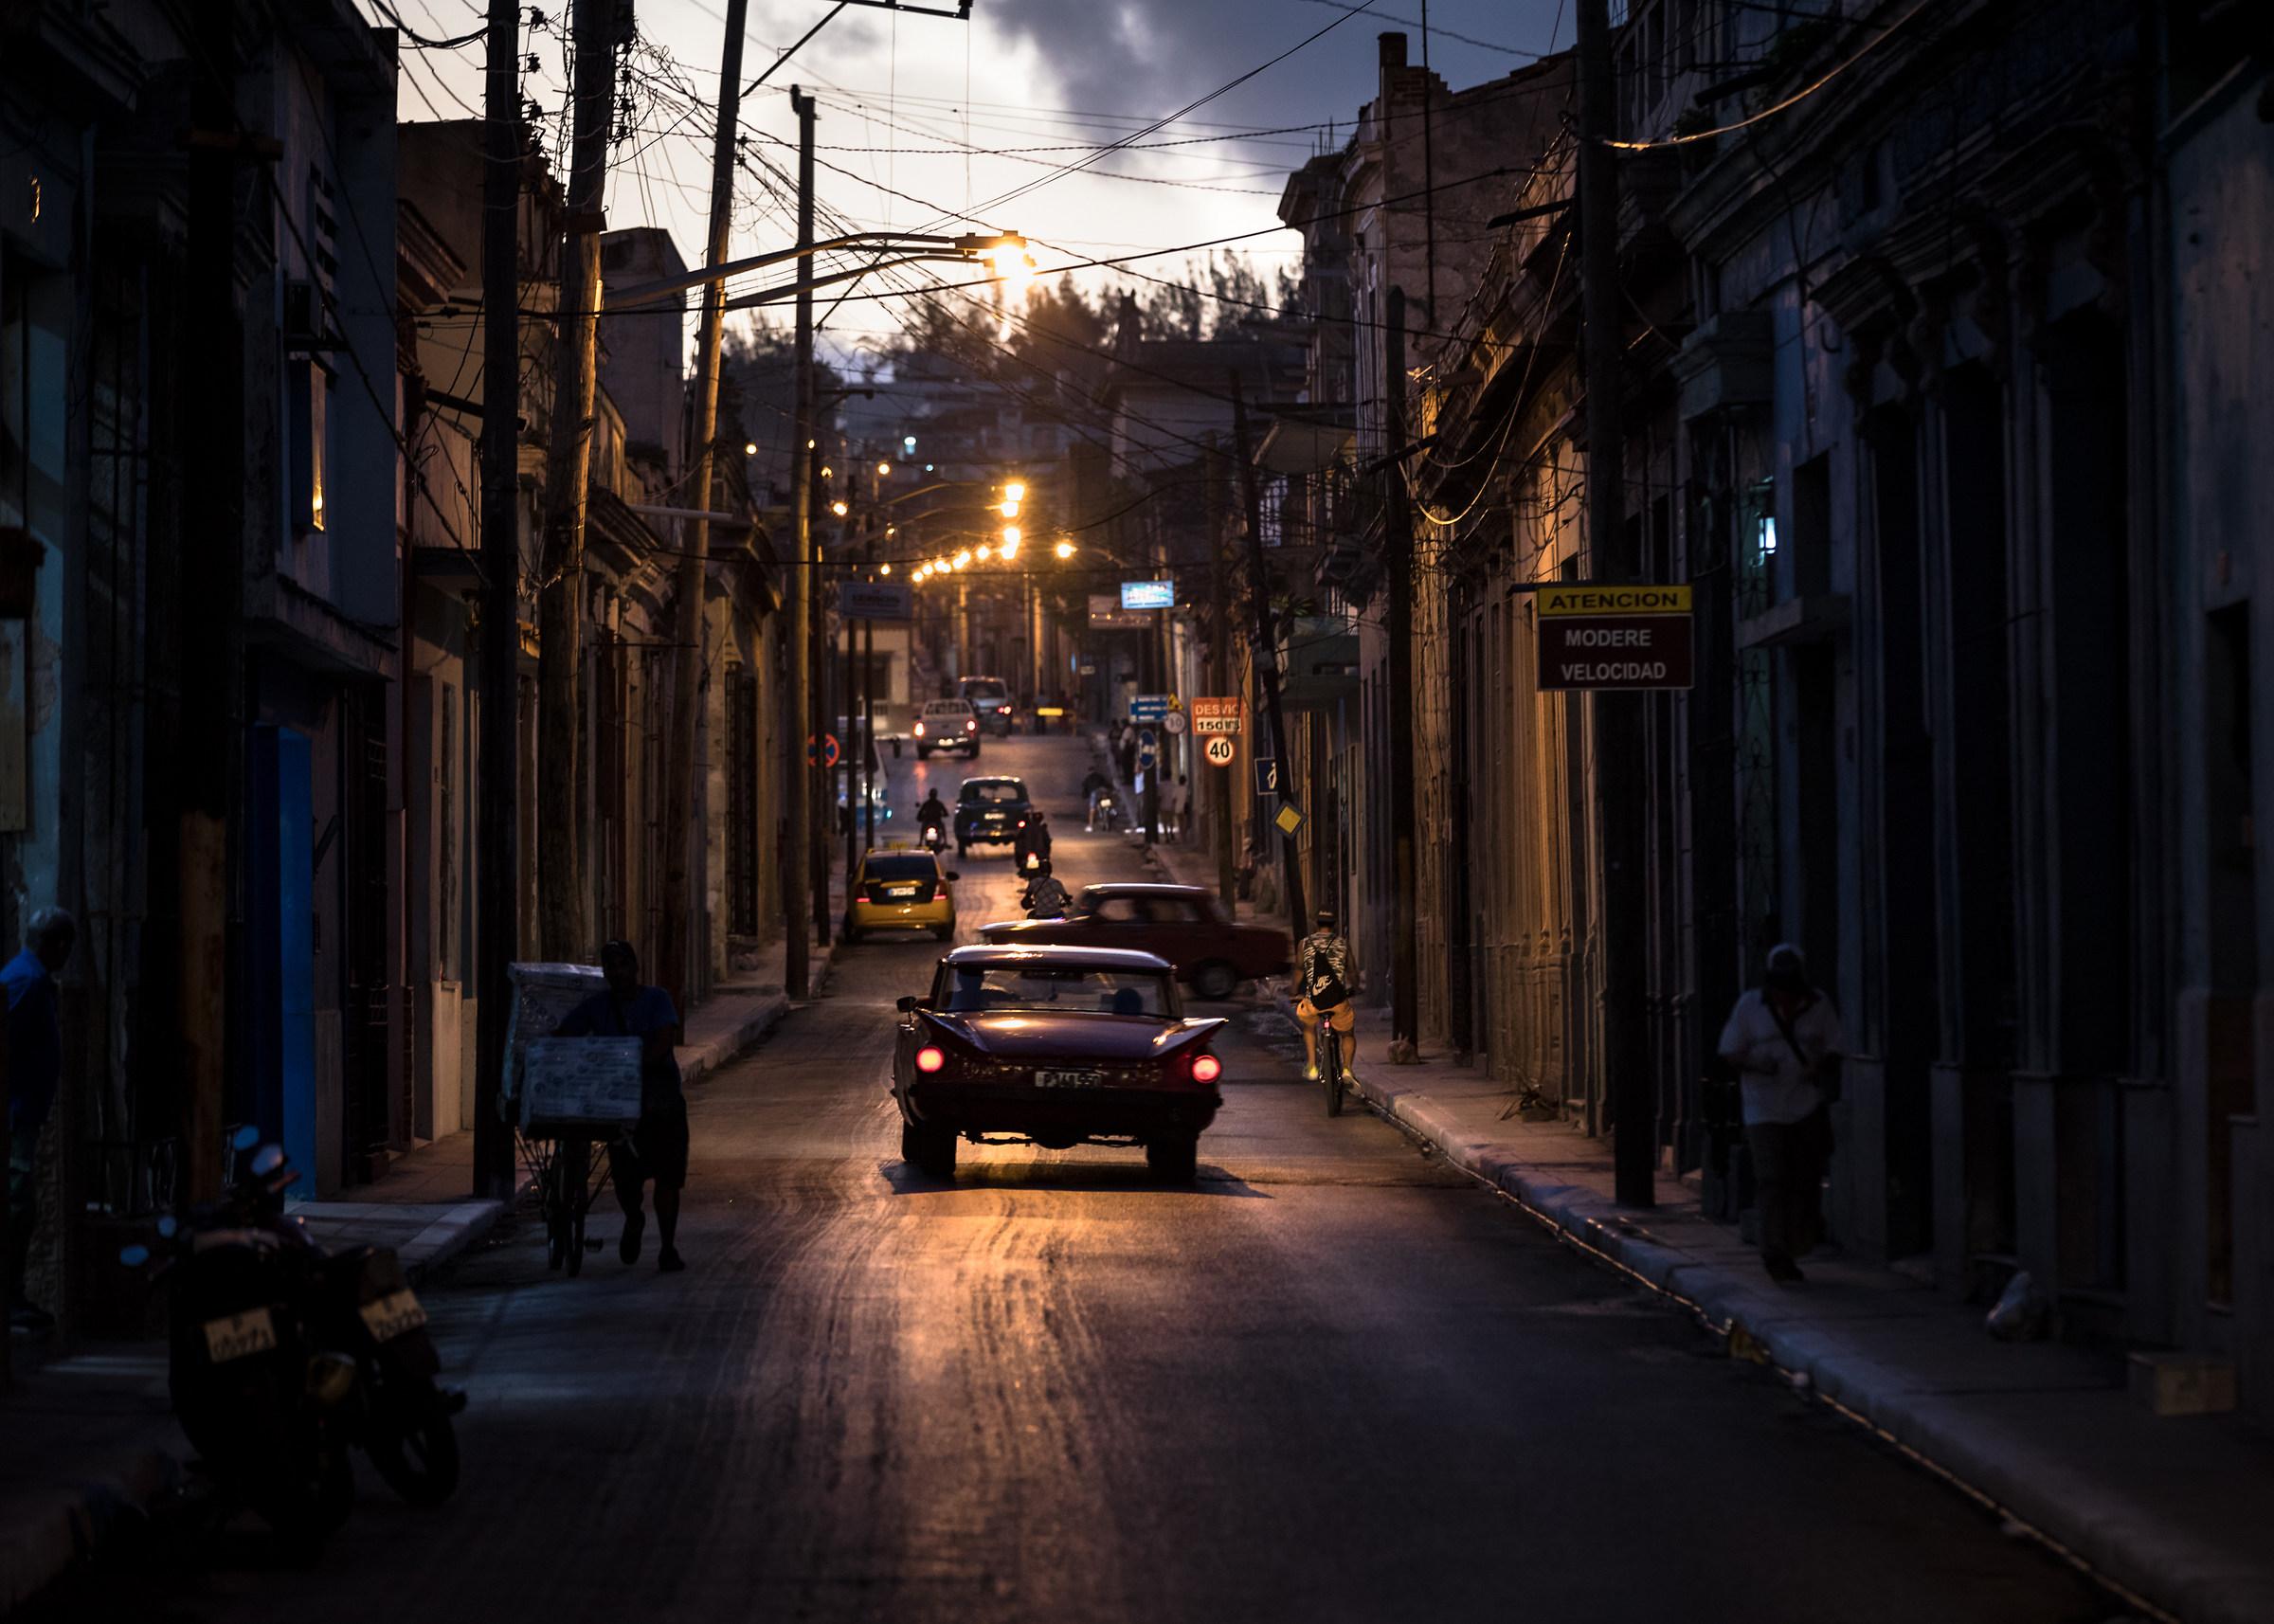 Nights streets of Matanzas...